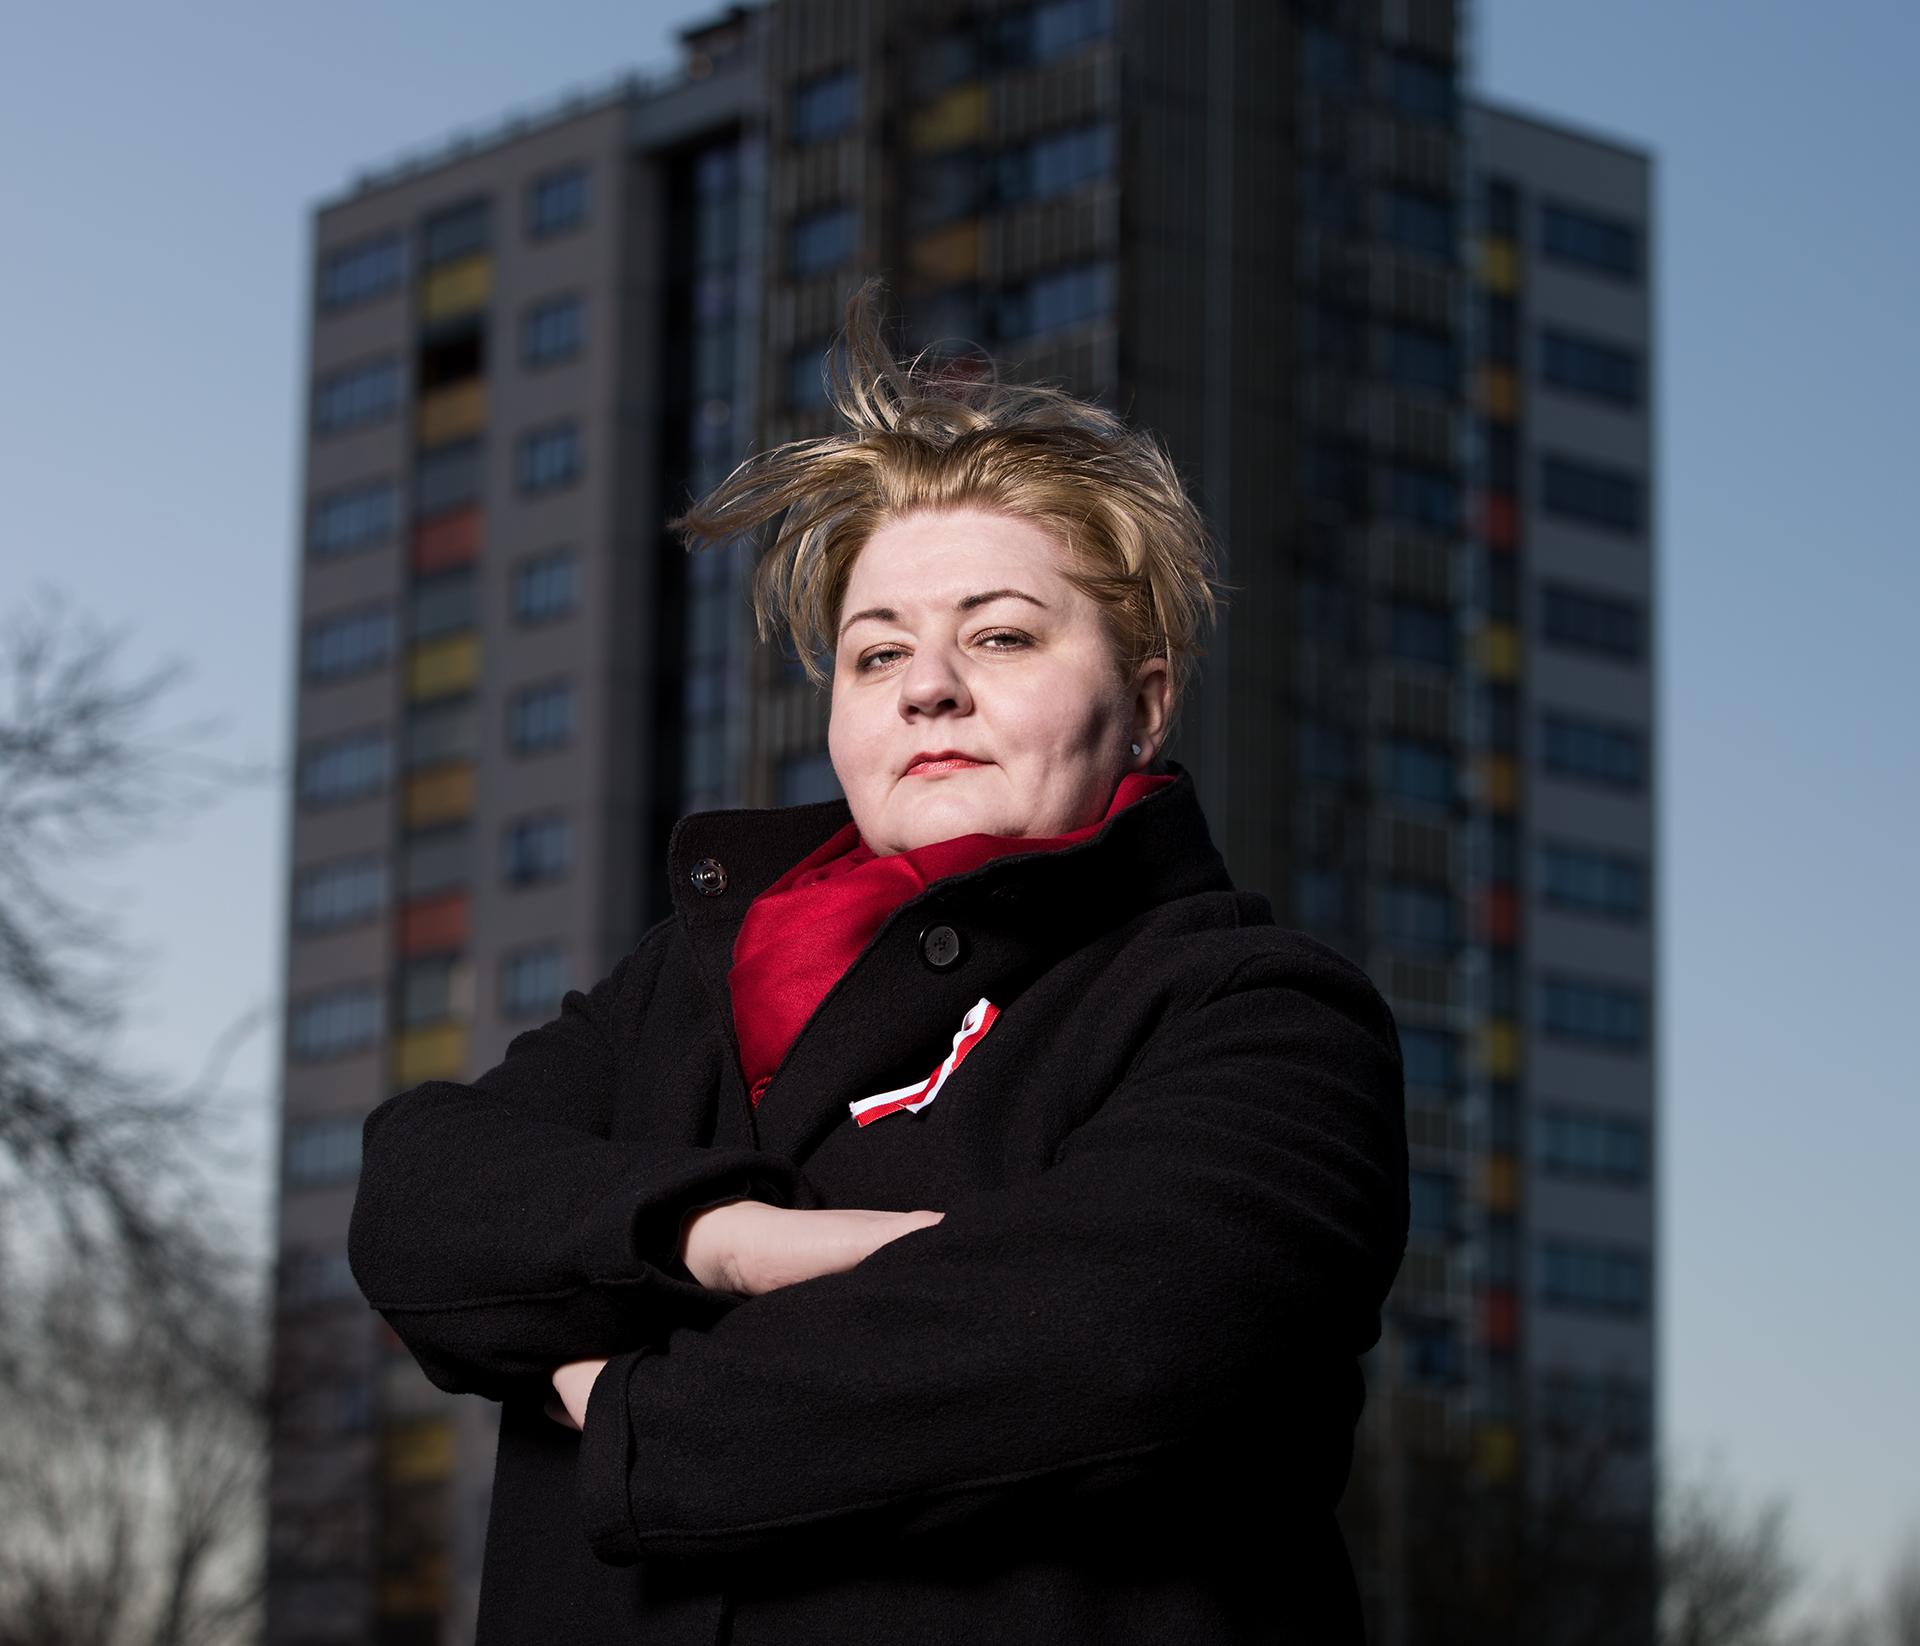 Ewa Gluza / Polish Community Leader in Oxford.